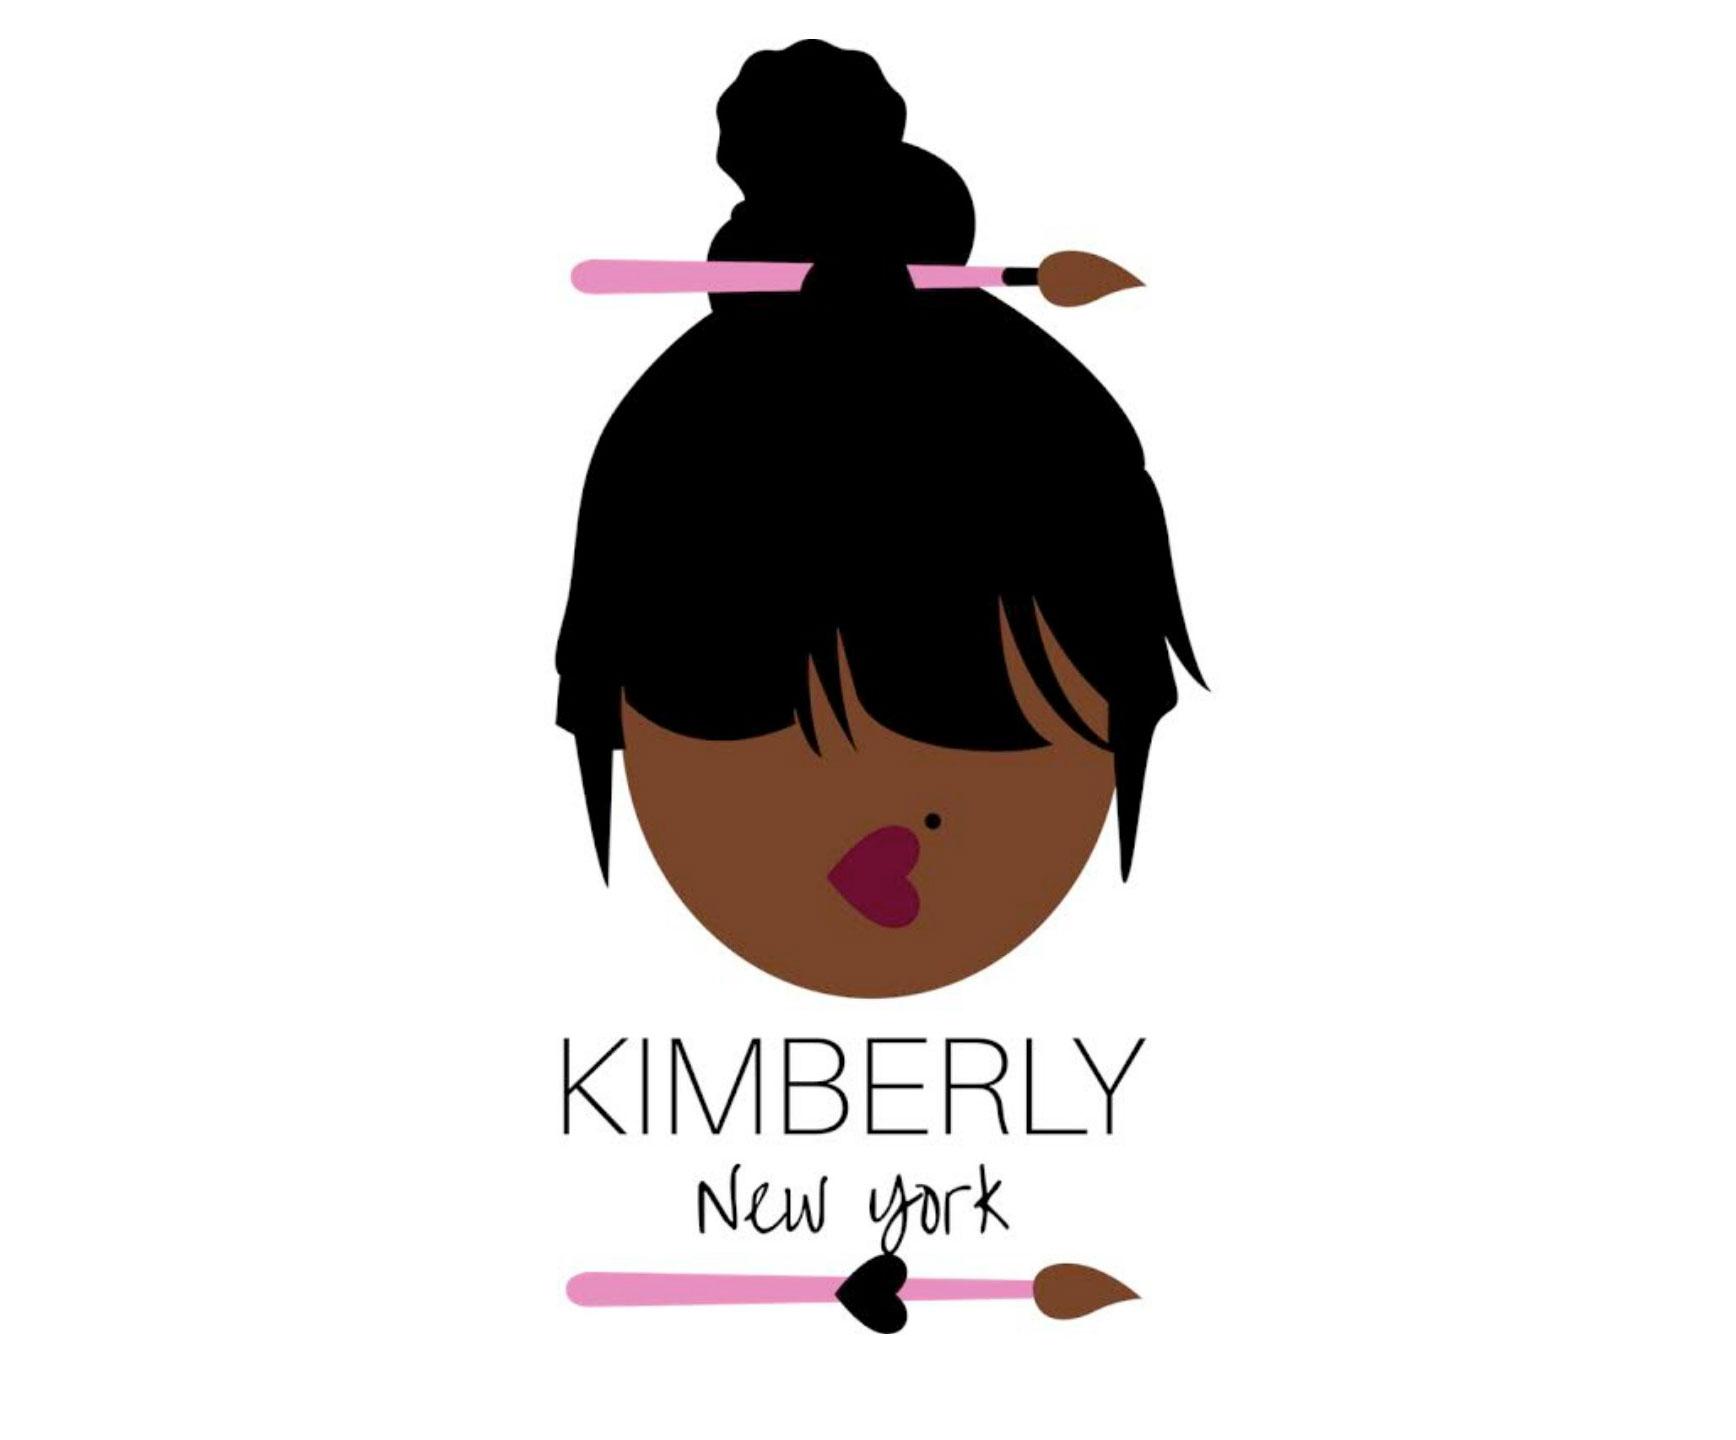 Kimberly New York Logo